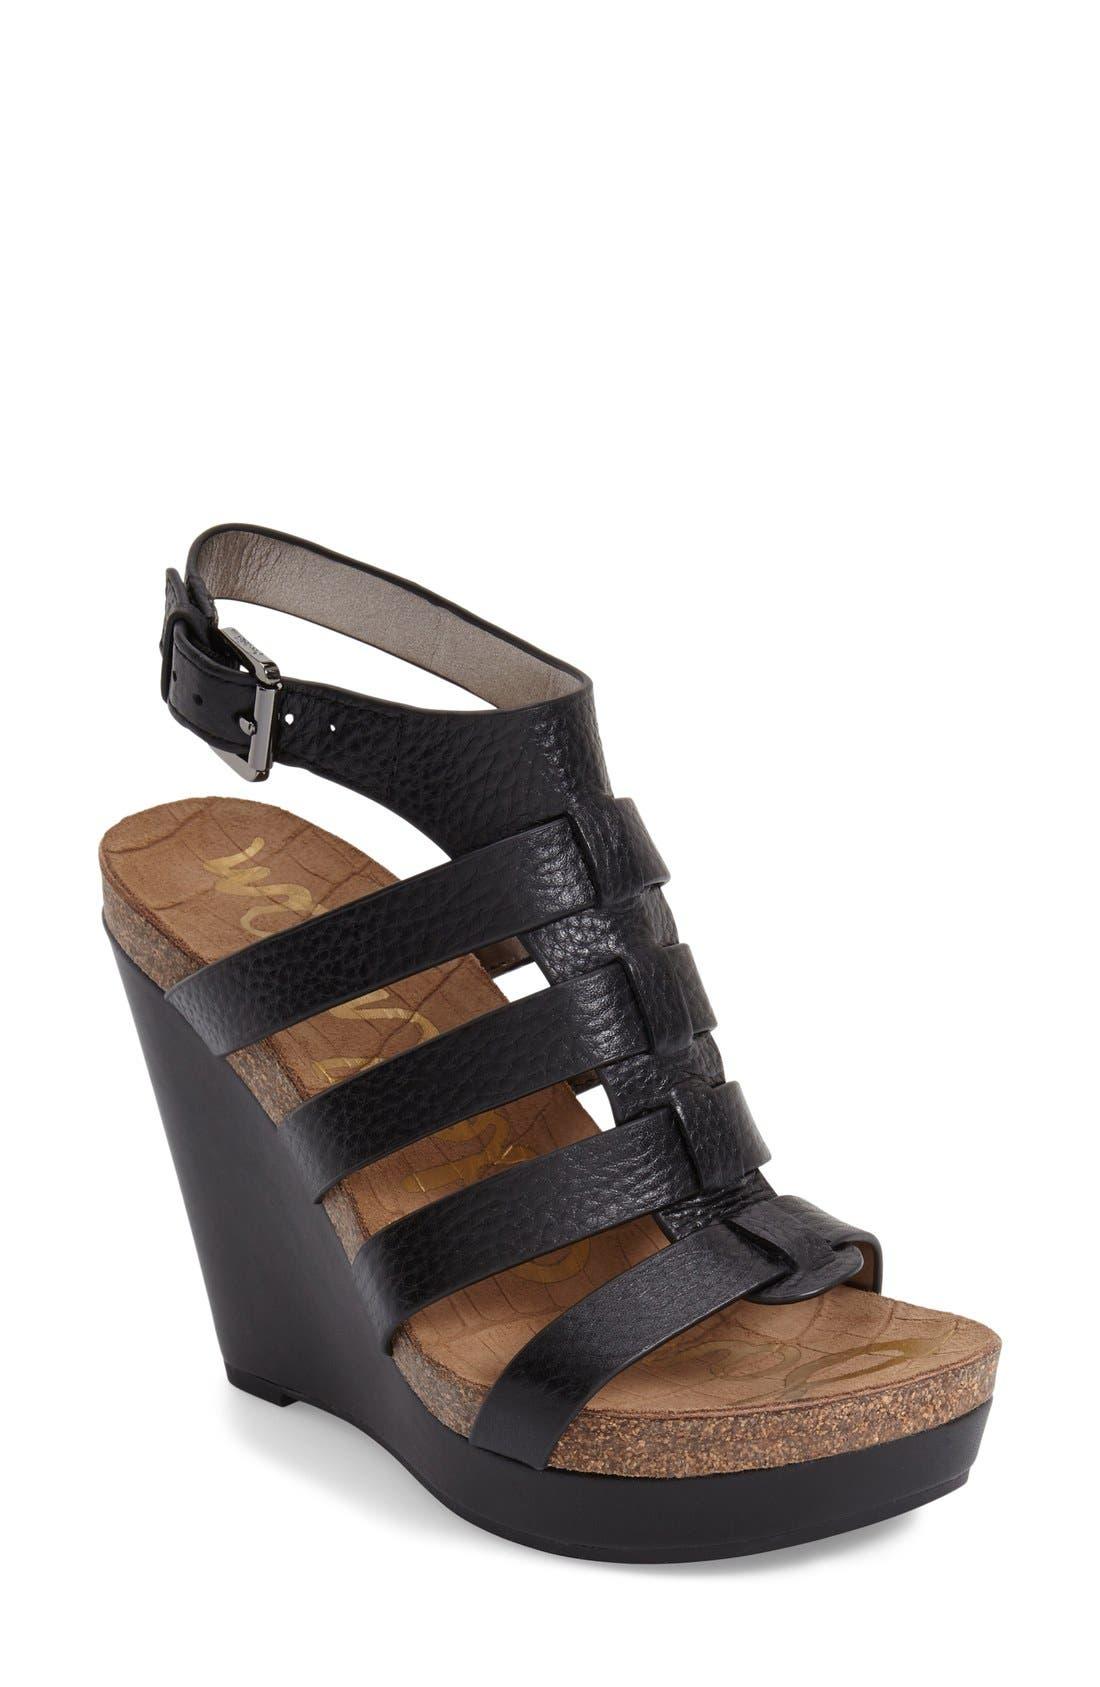 Alternate Image 1 Selected - Sam Edelman 'Nayla' Sandal (Women)